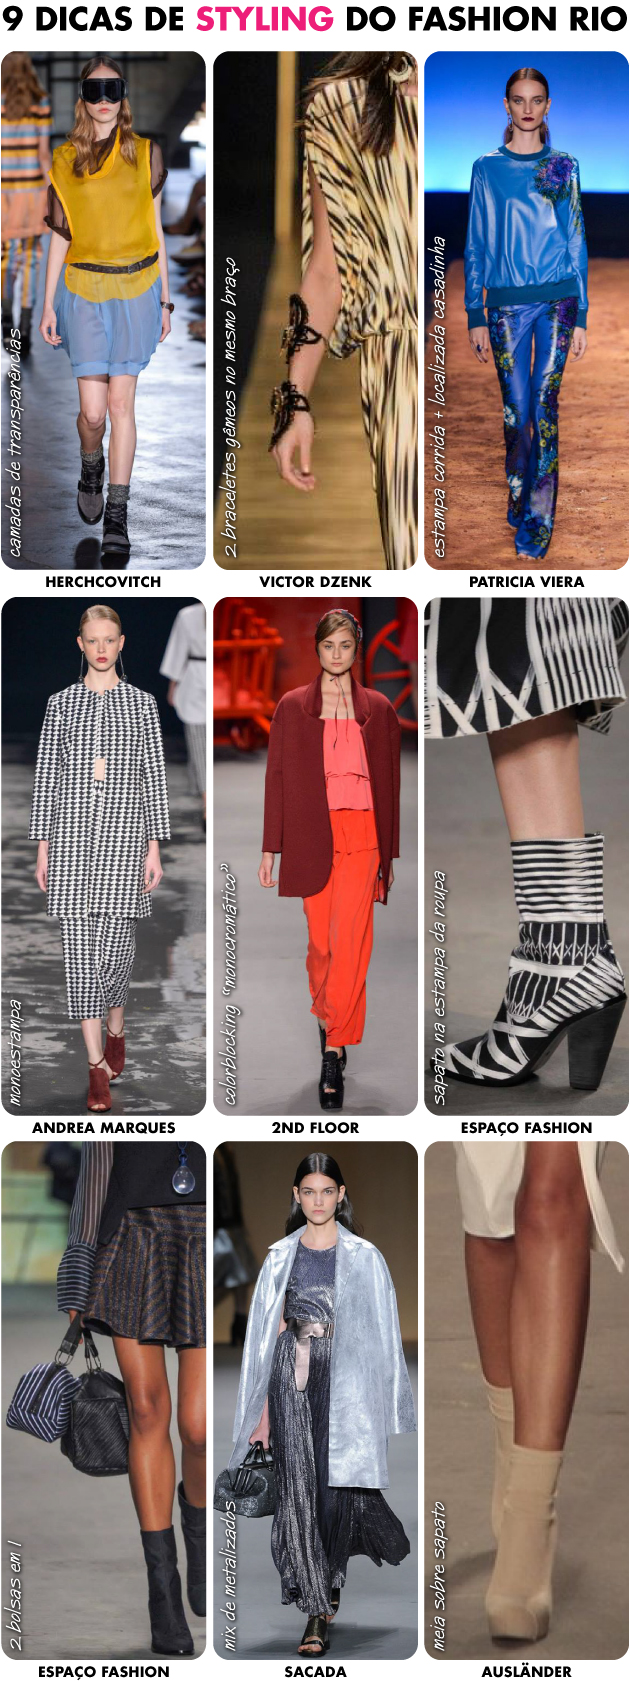 truqes-styling-fashion-rio-producao-desfile-fashion-rio-inverno-2014-passarela-ruas